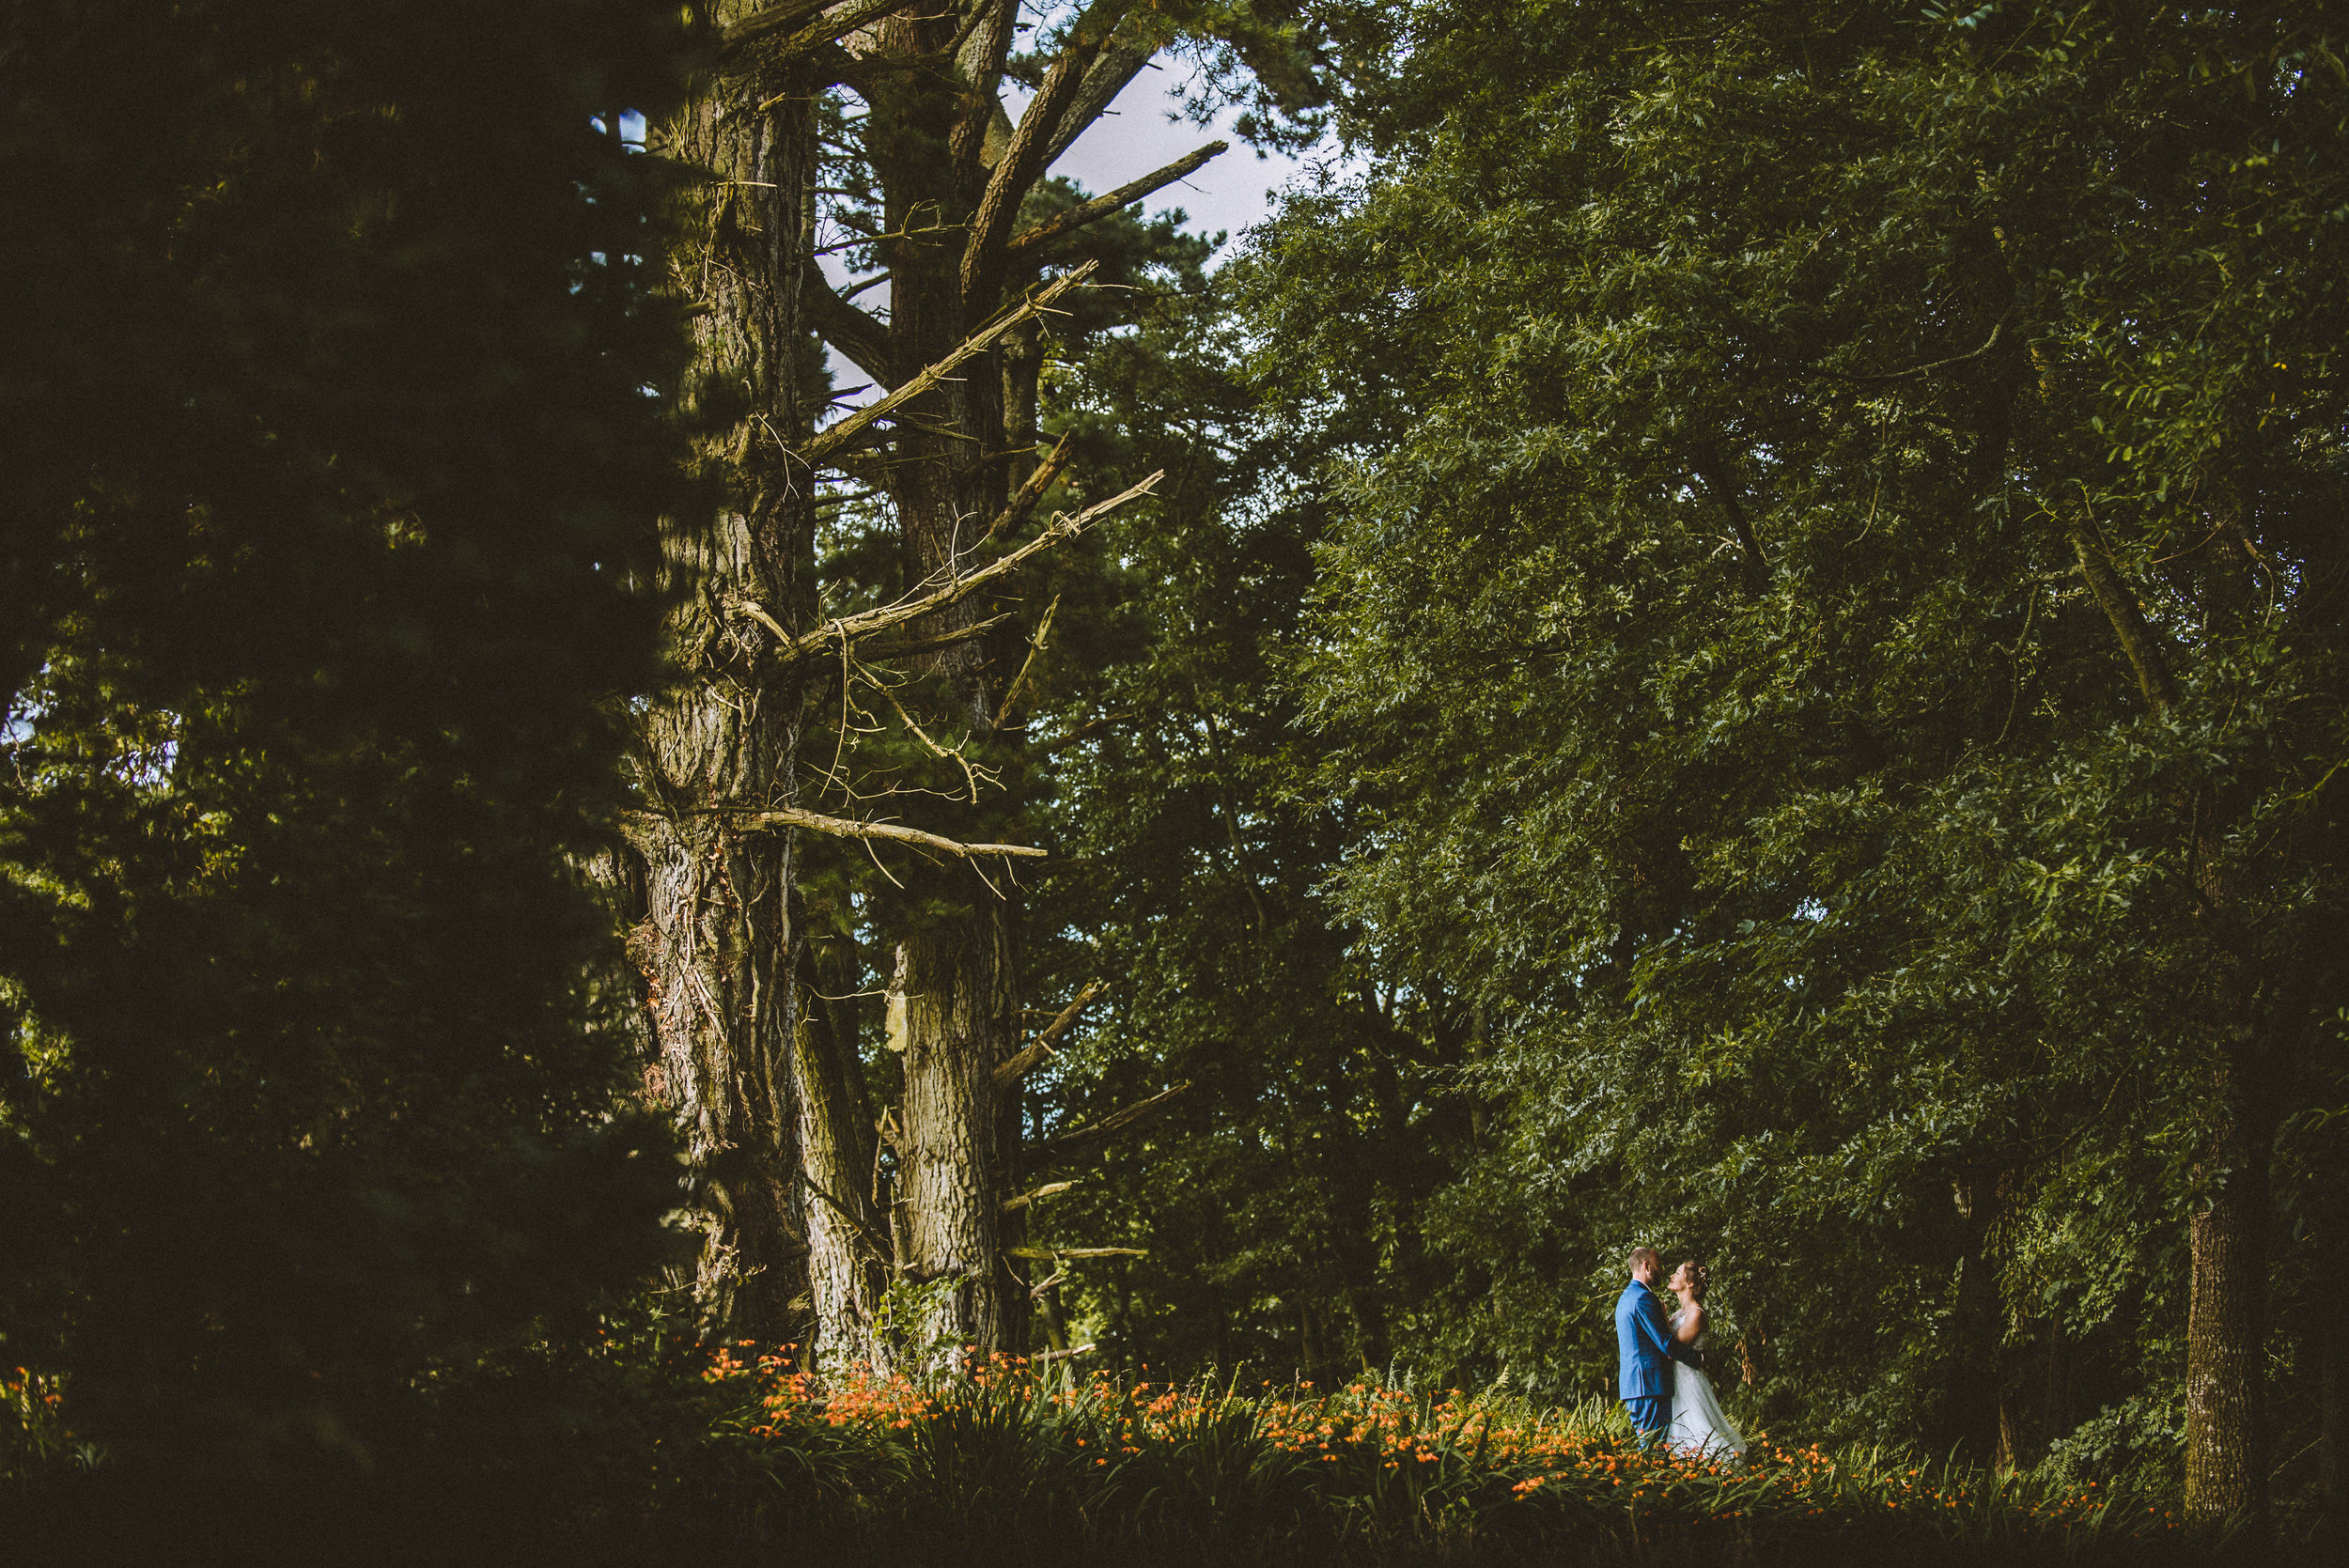 pencarrow-house-wedding-photographer-93.jpg